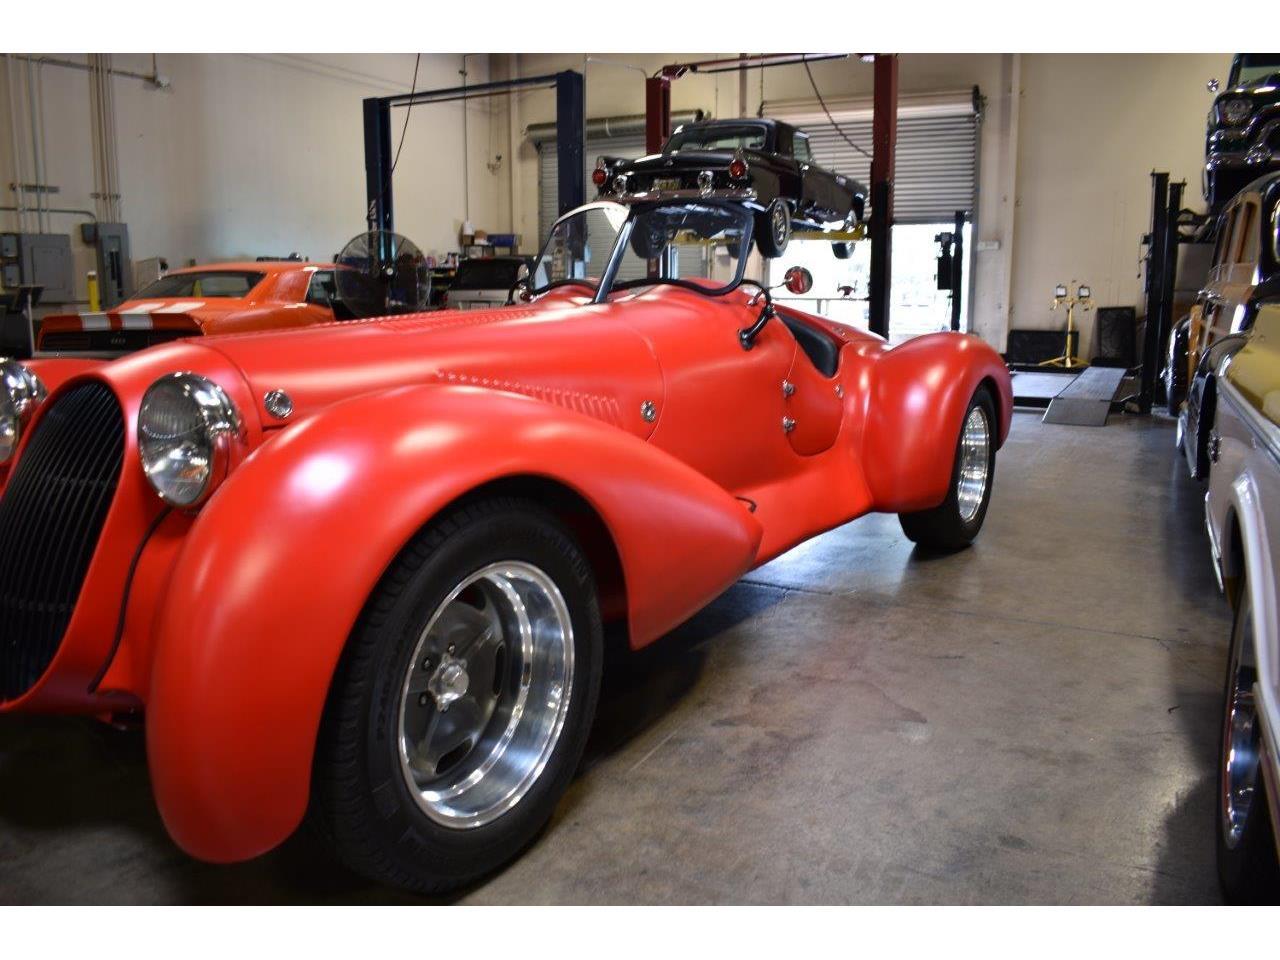 2017 Custom Car (CC-1229343) for sale in Costa Mesa, California